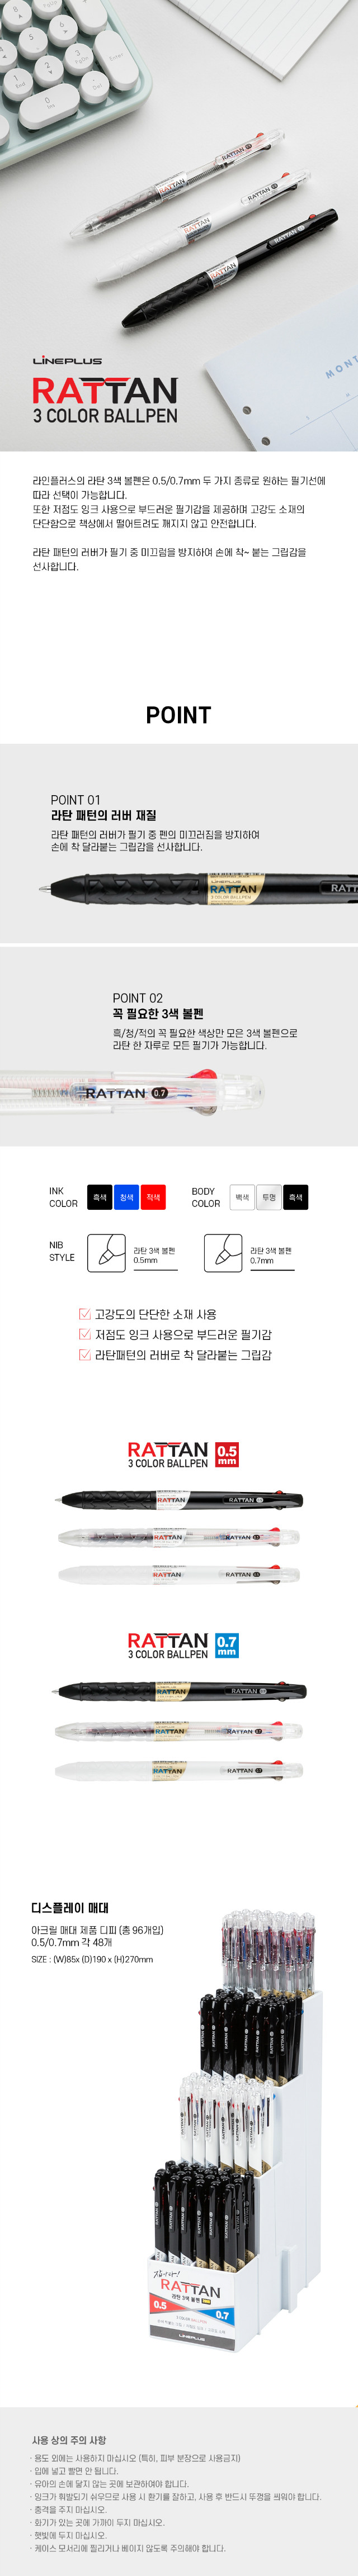 rattan05+07_list.jpg